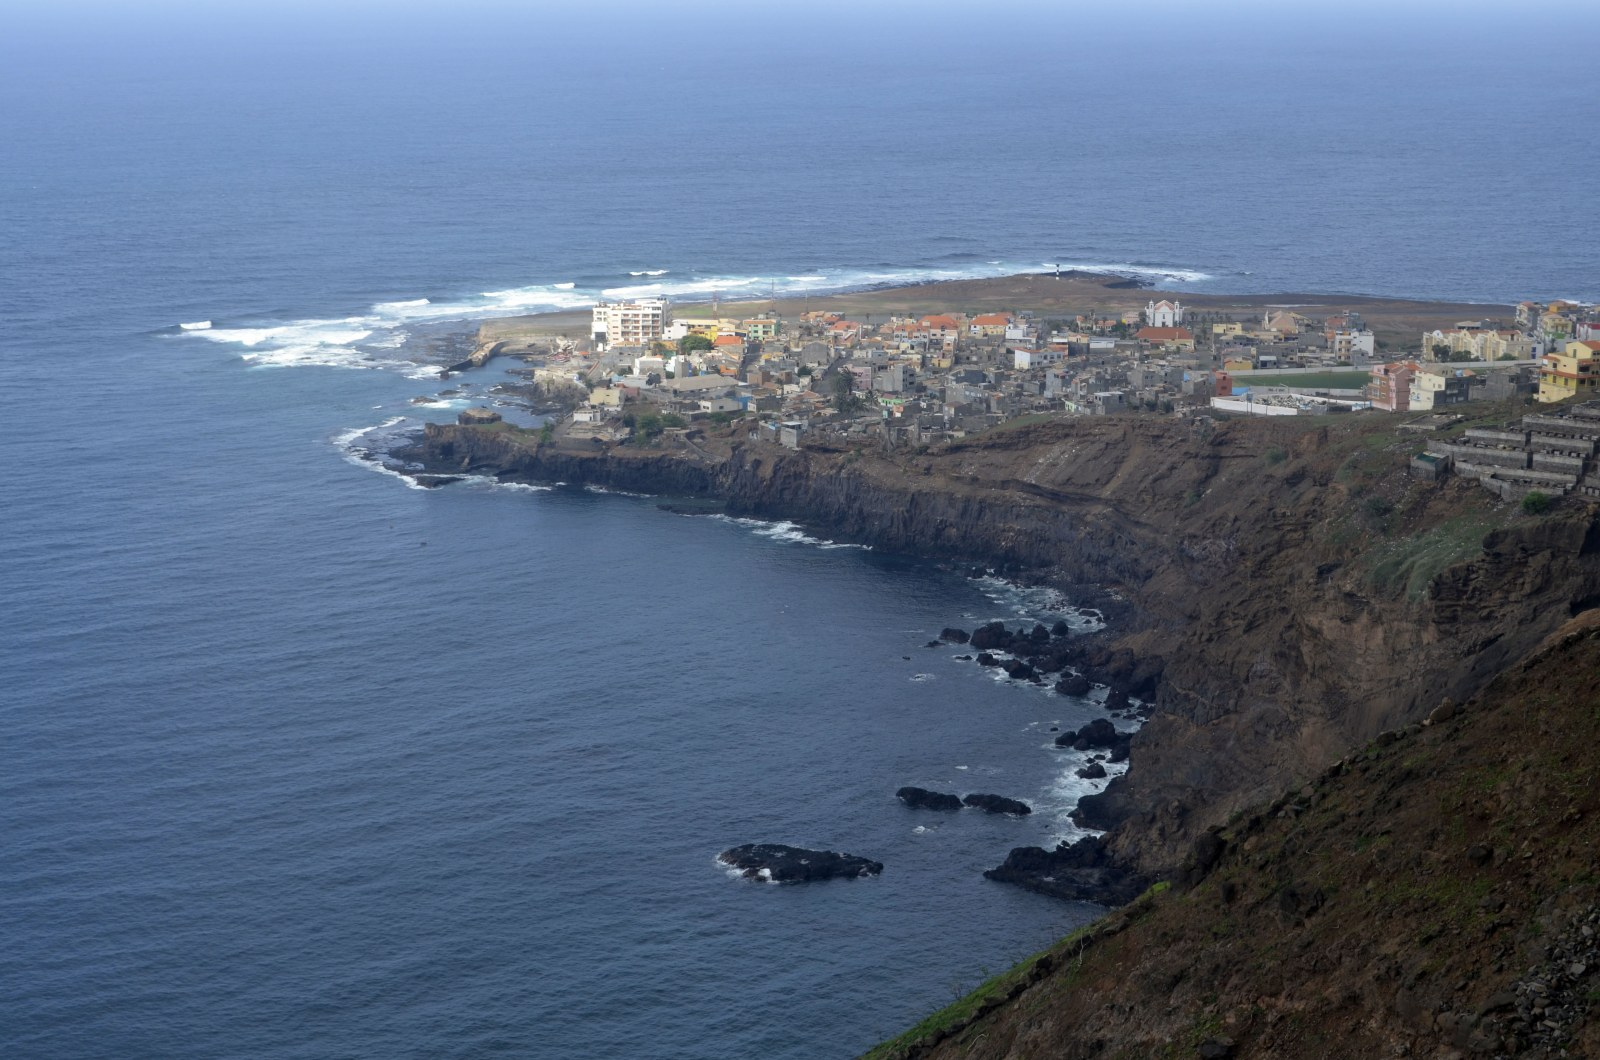 Blick auf Ponta do Sol auf Santo Antao